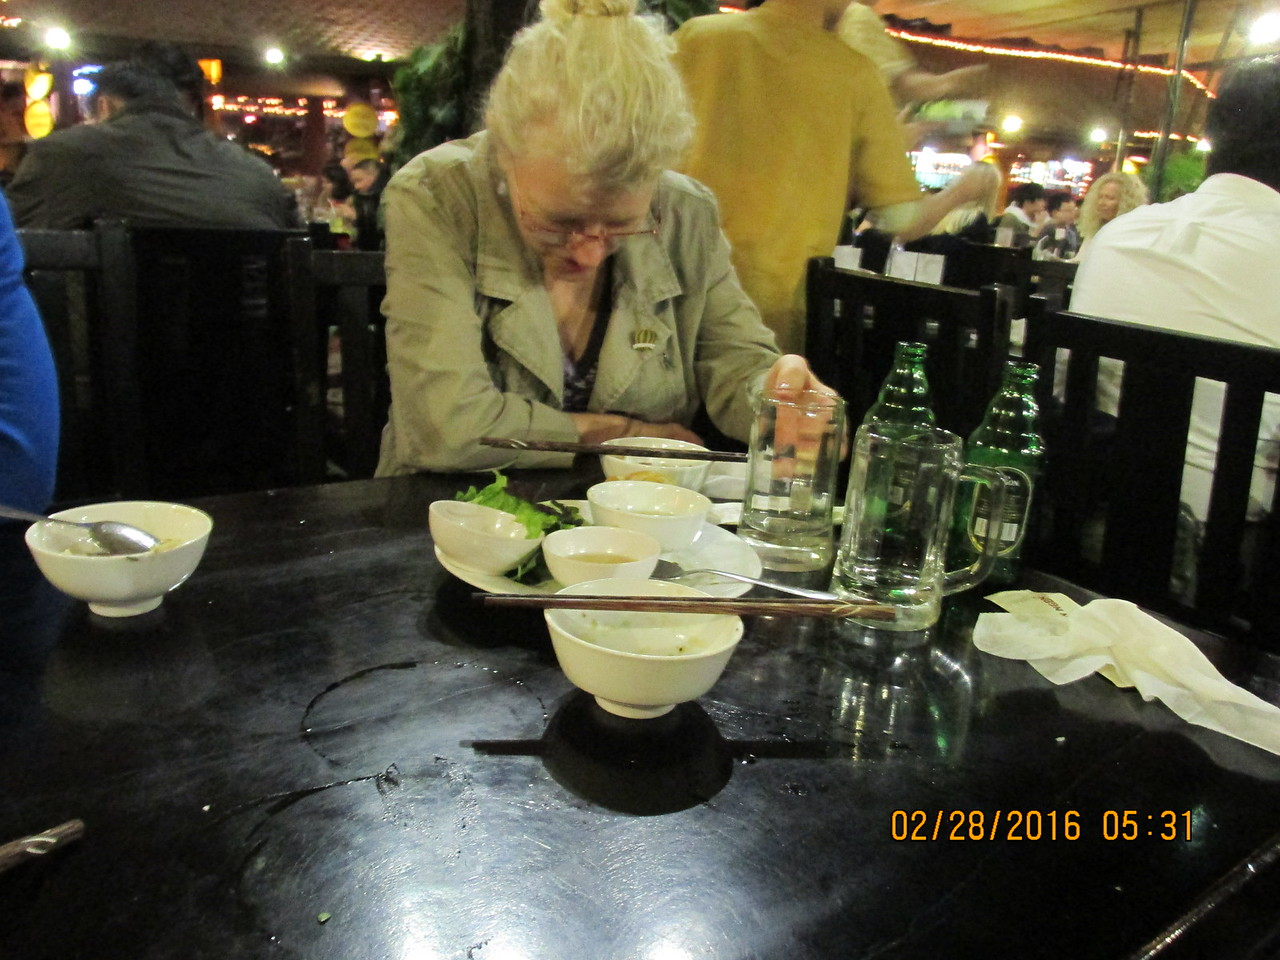 0065 - Sarah at Quan An Ngon Restaurant on Phan Boi Chau - Hanoi Vietnam - Date Correct but Time on Pic is Wrong